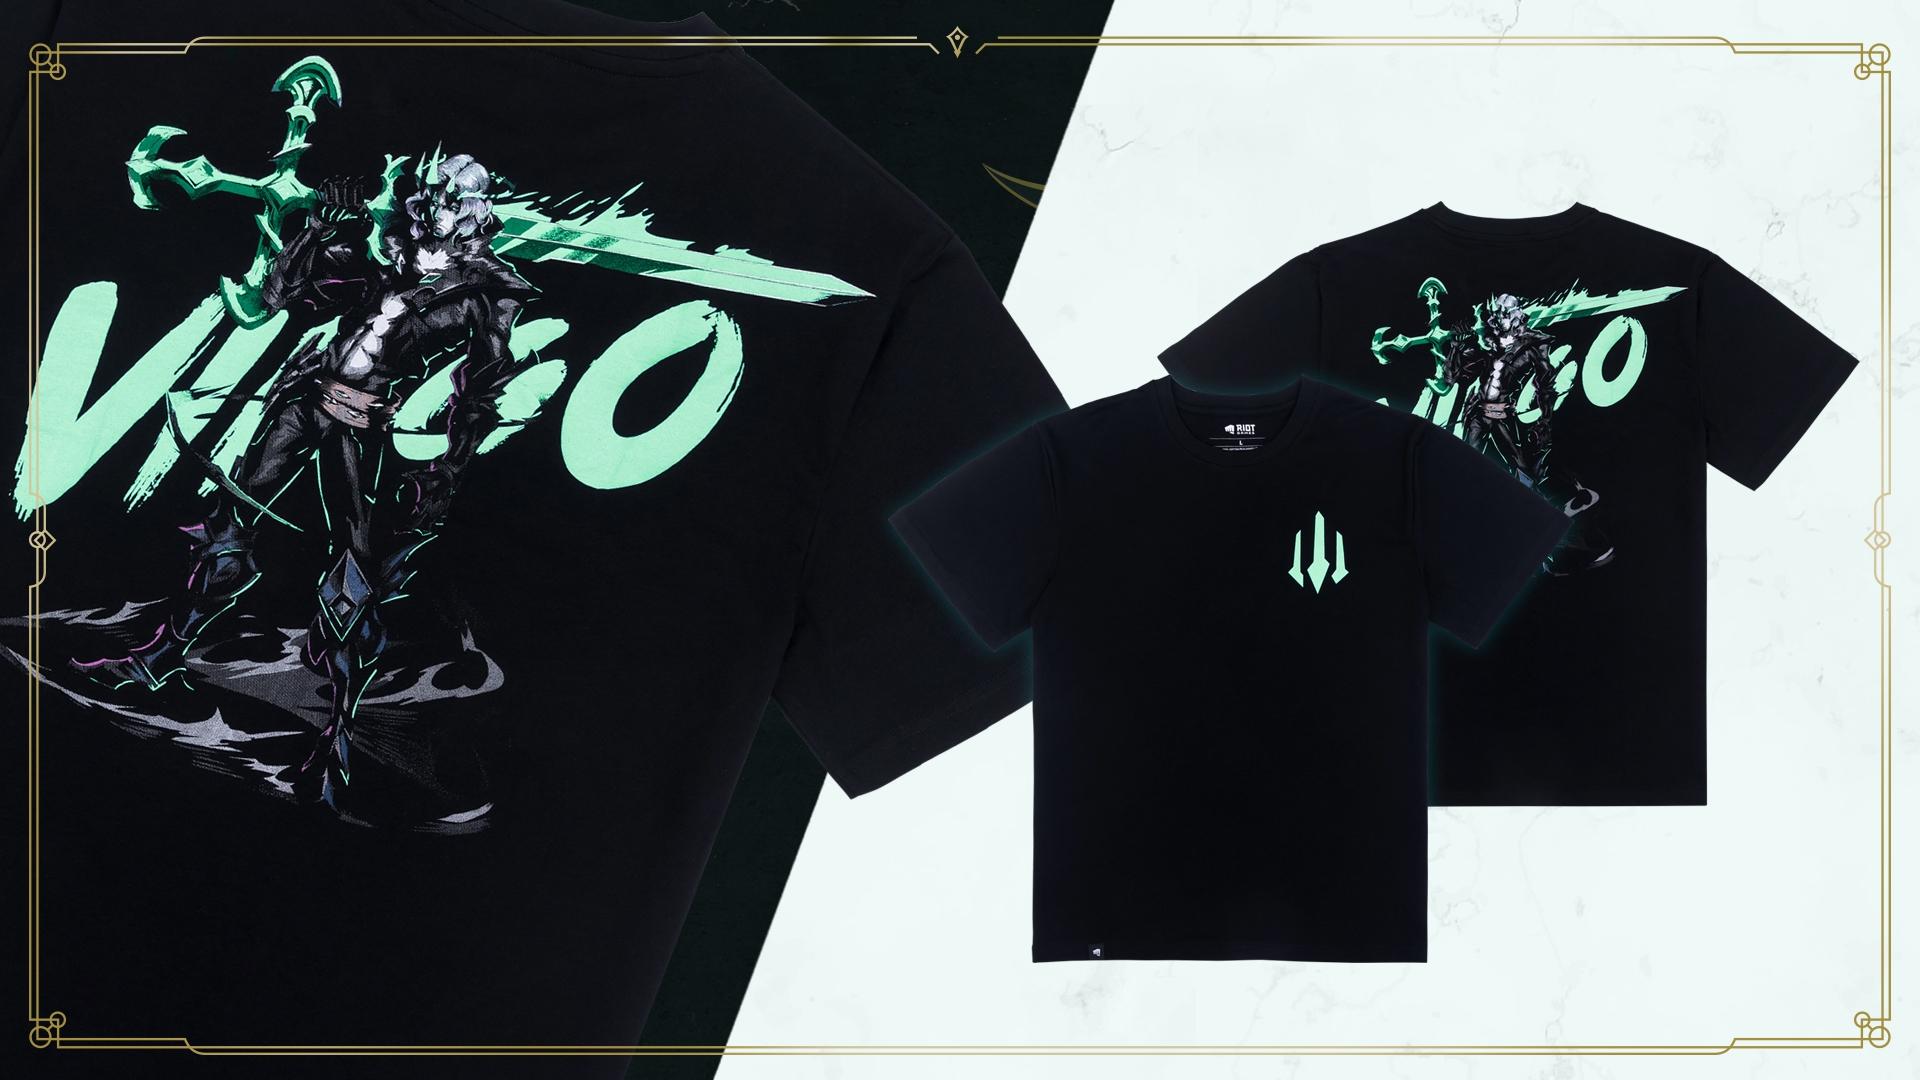 05_Viego_T-shirts.jpg